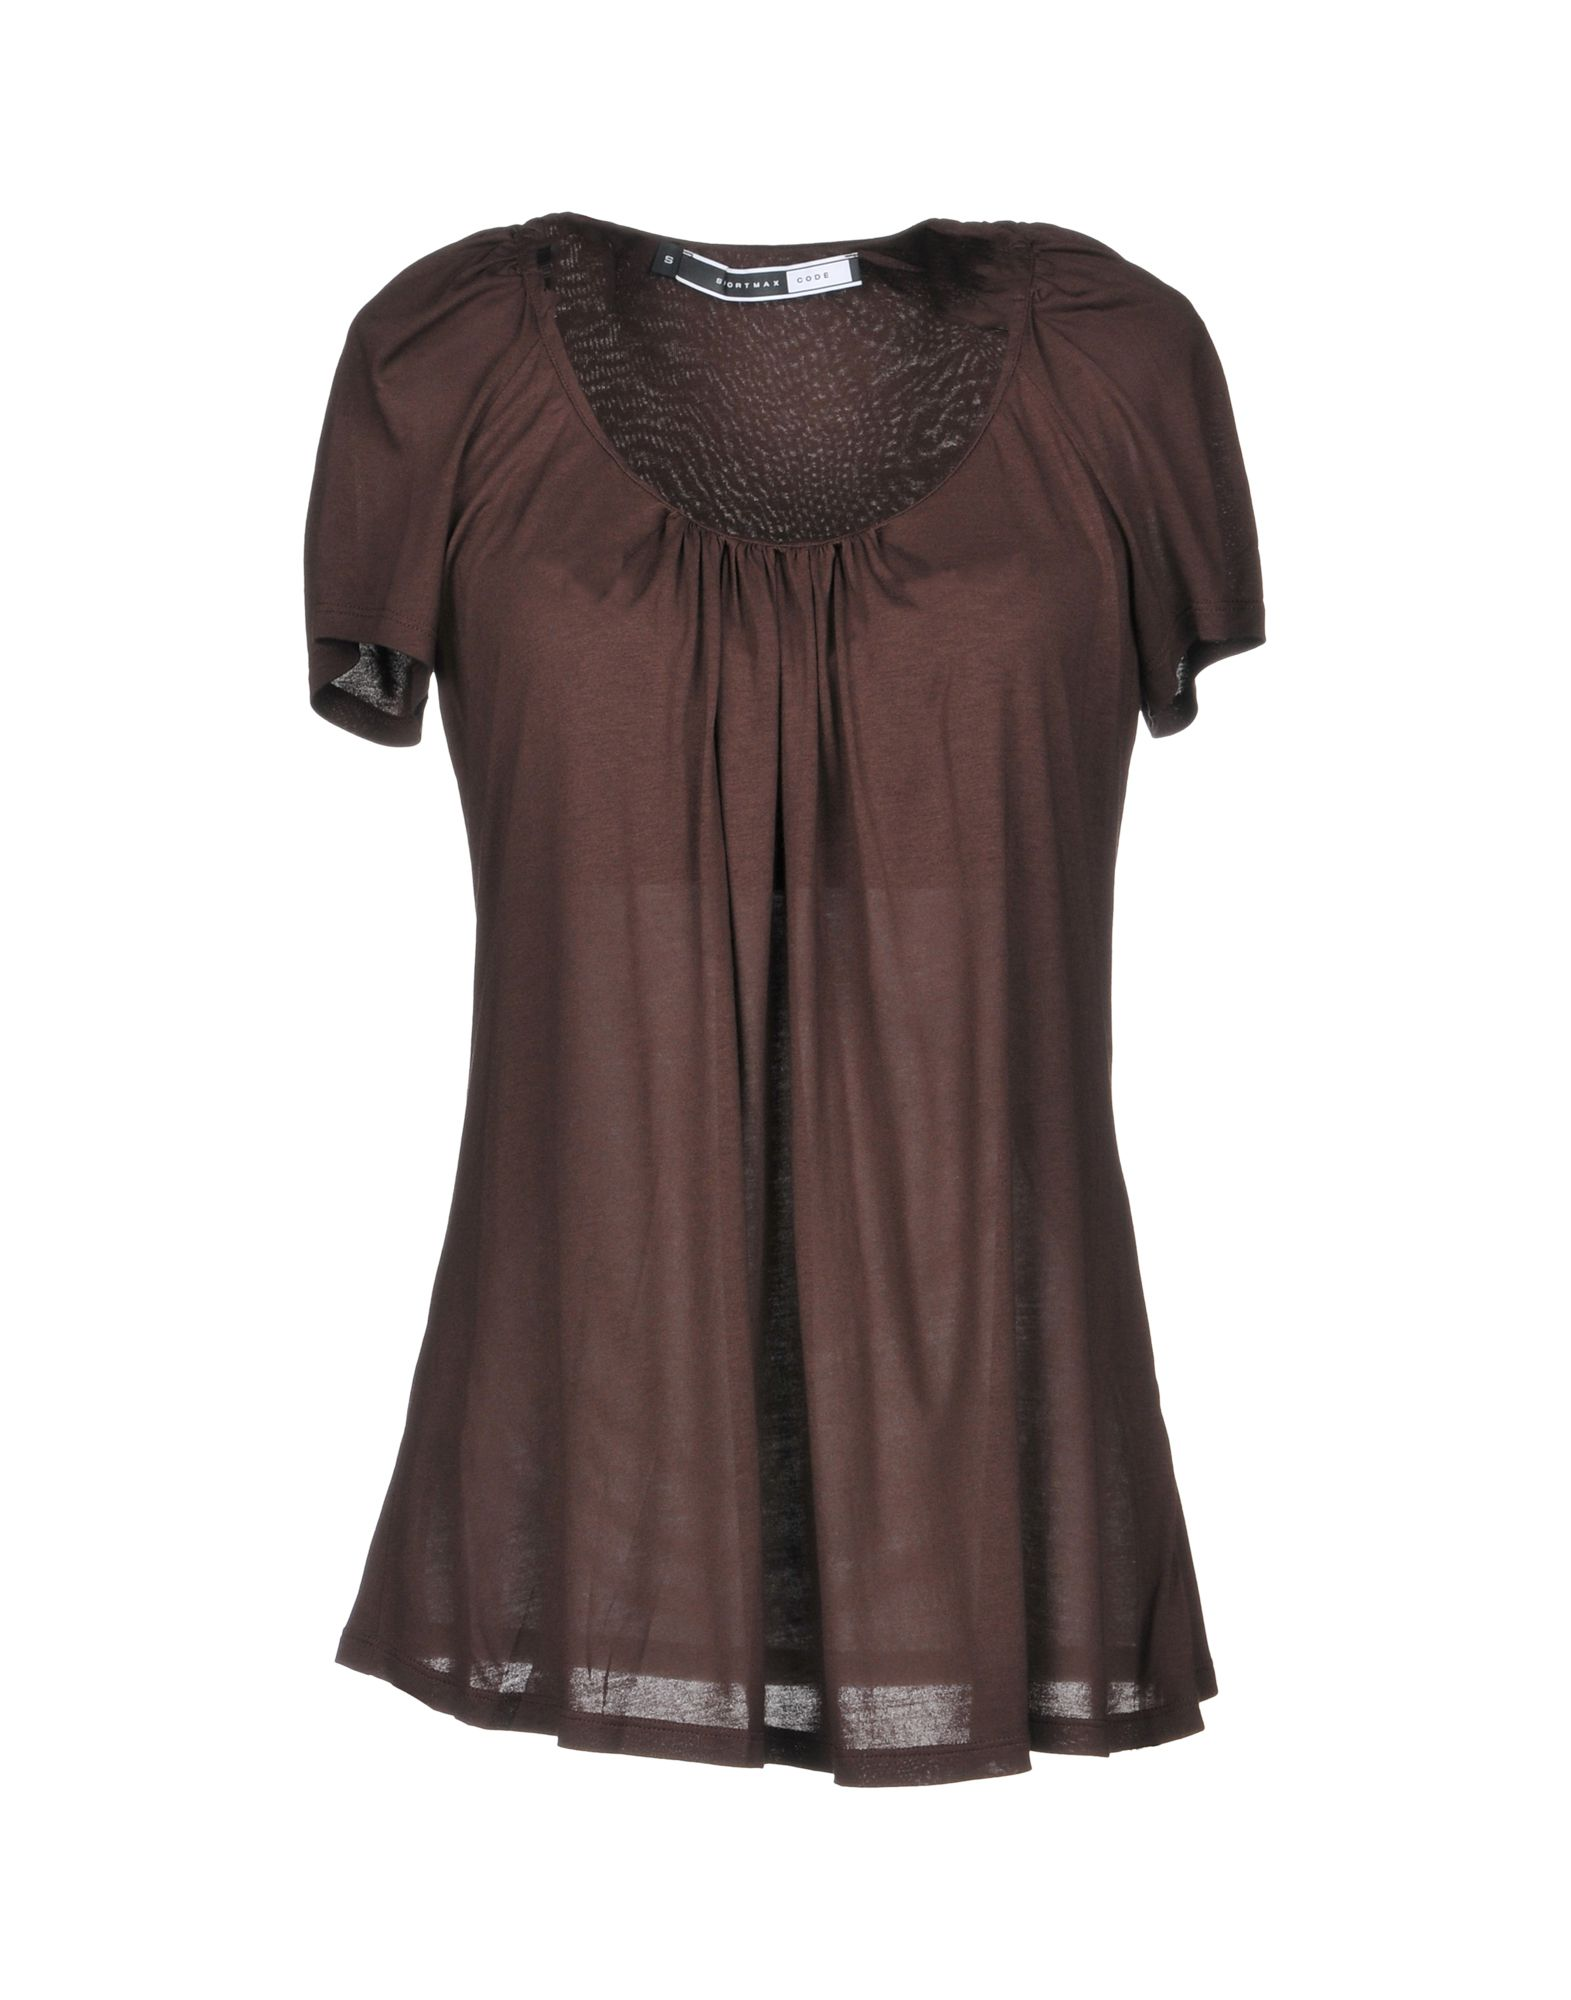 SPORTMAX CODE Damen T-shirts Farbe Dunkelbraun Größe 6